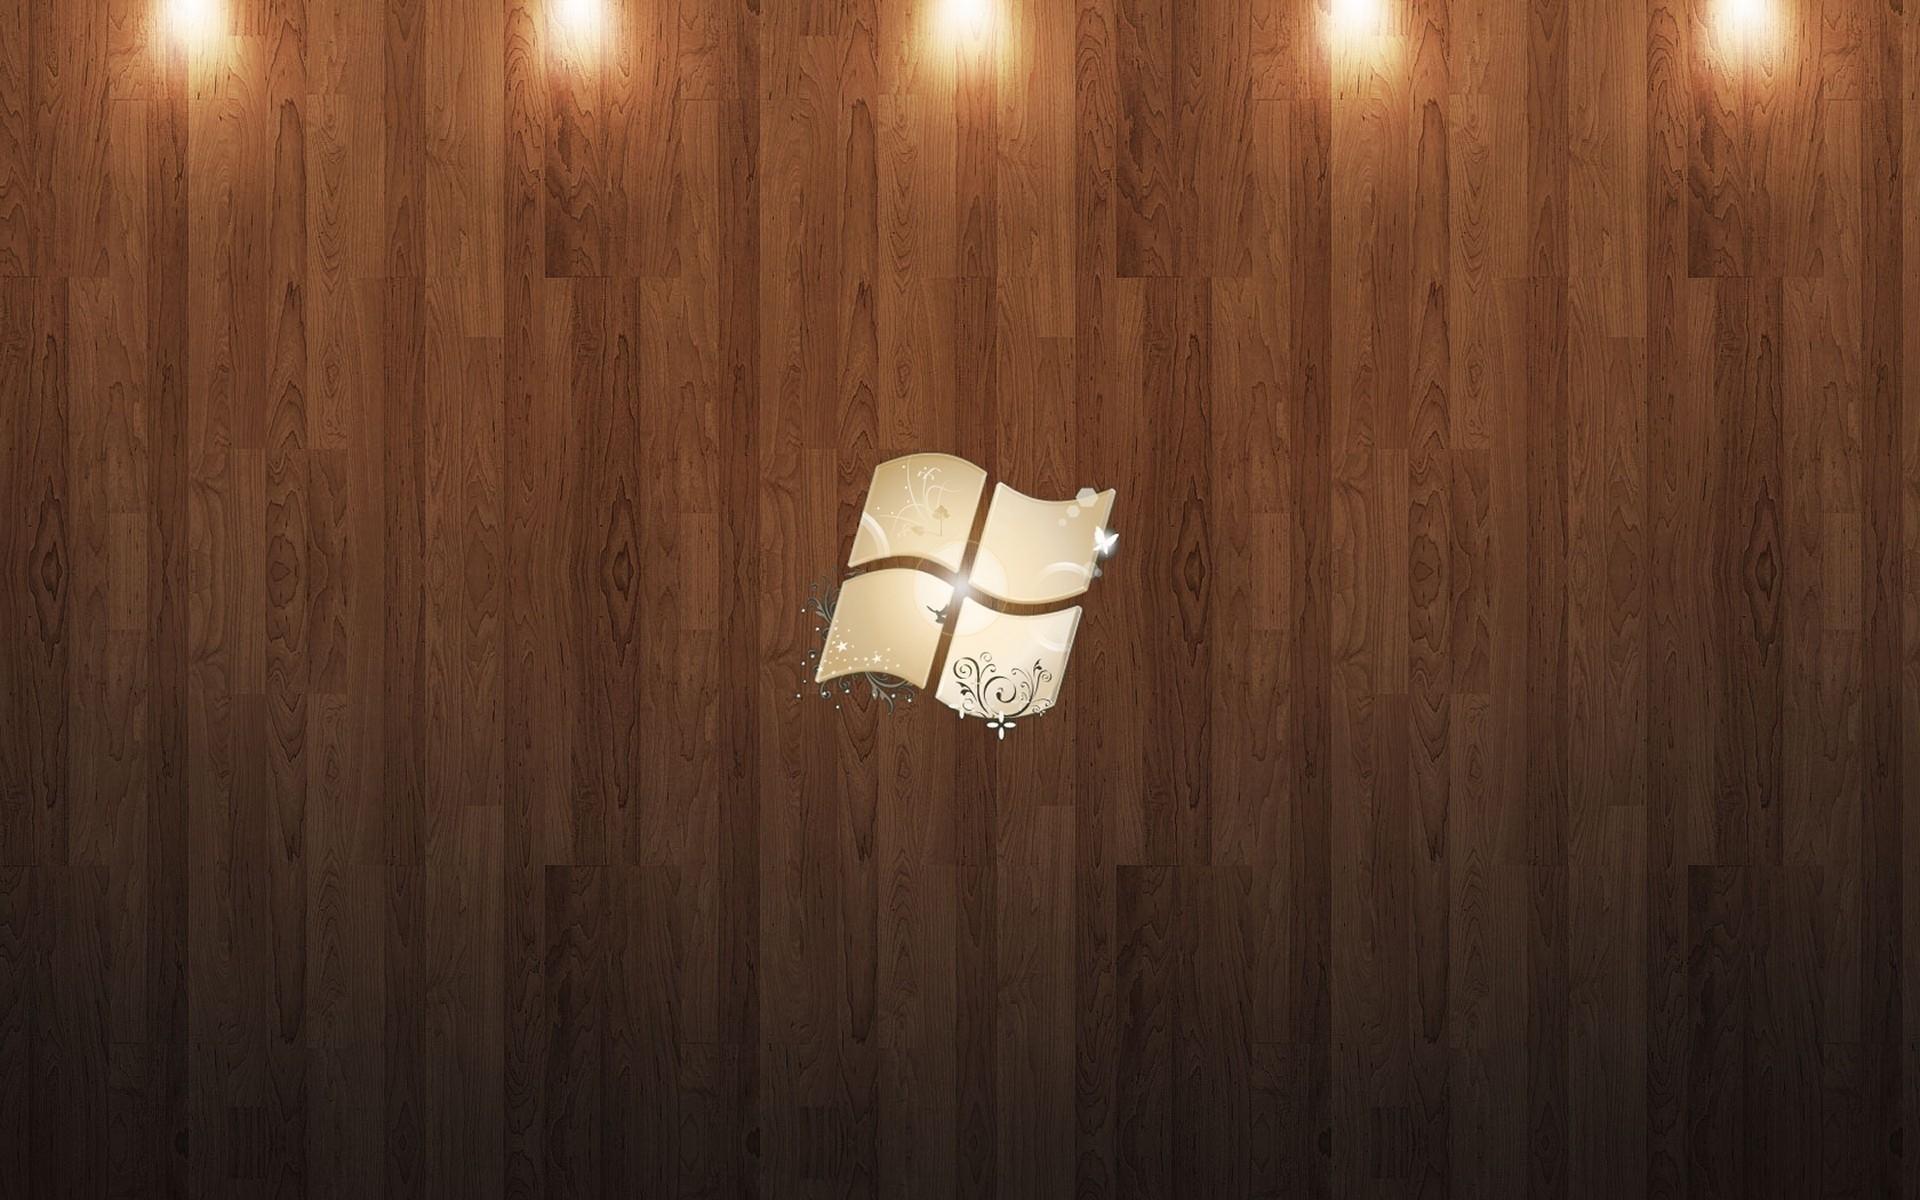 windows on wood computer desktop wallpaper hd. - media file